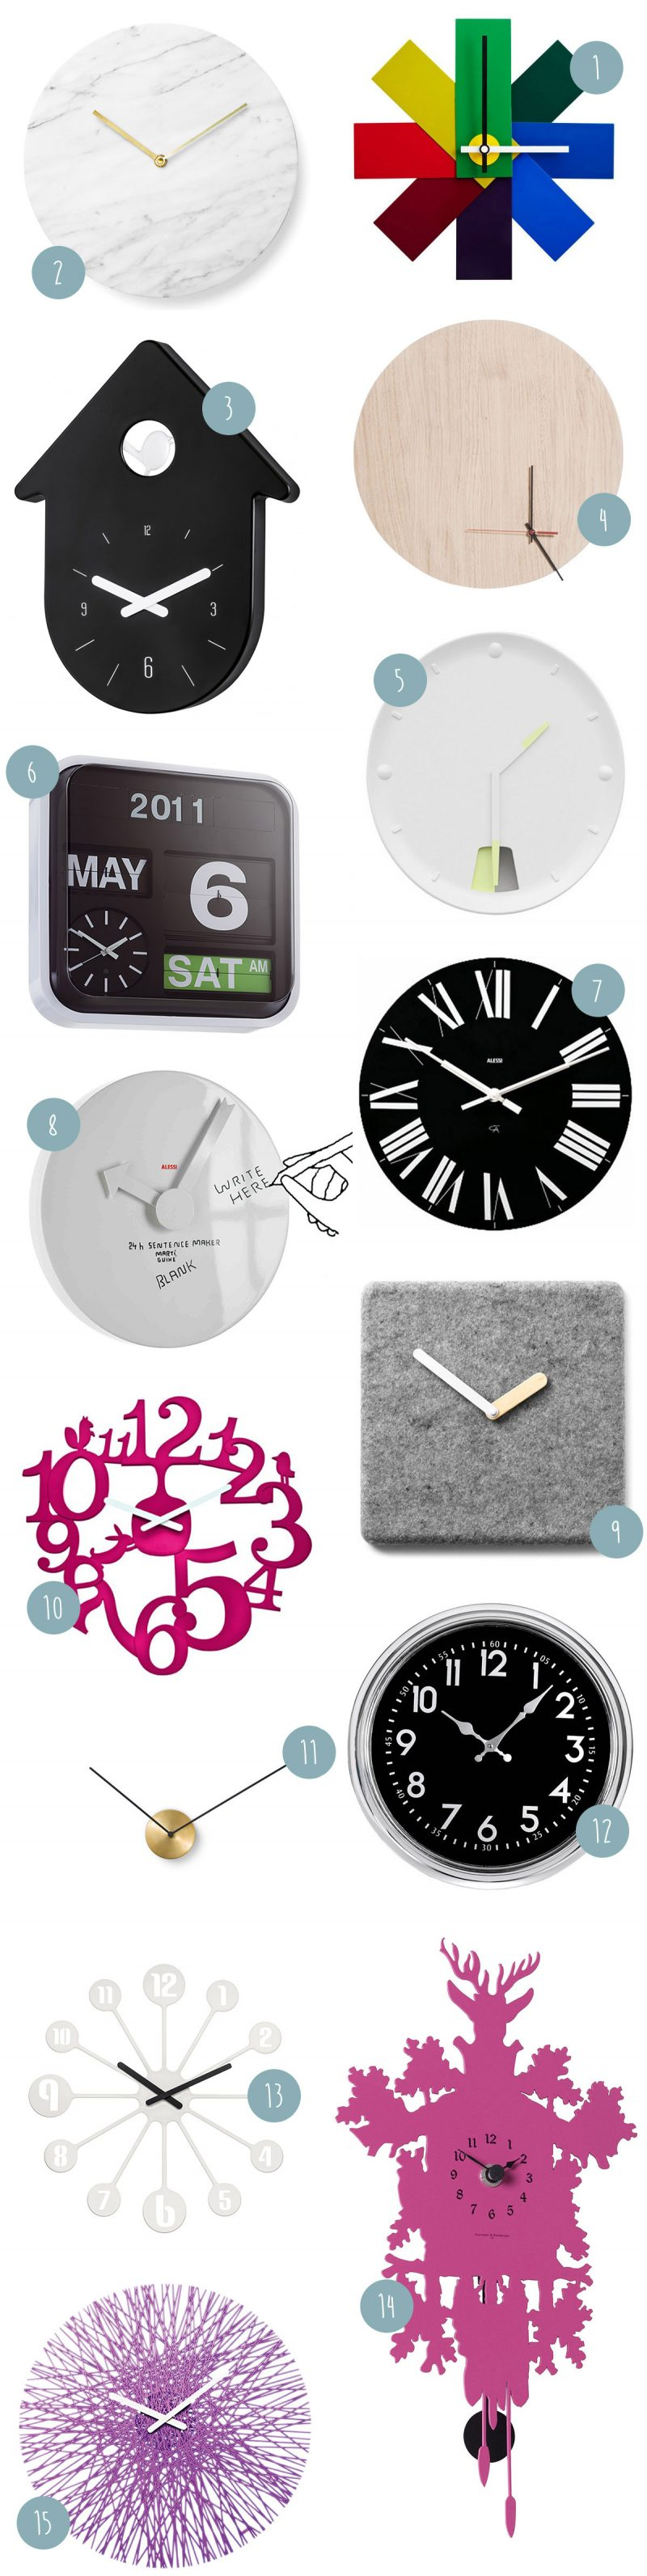 Idée déco horloge